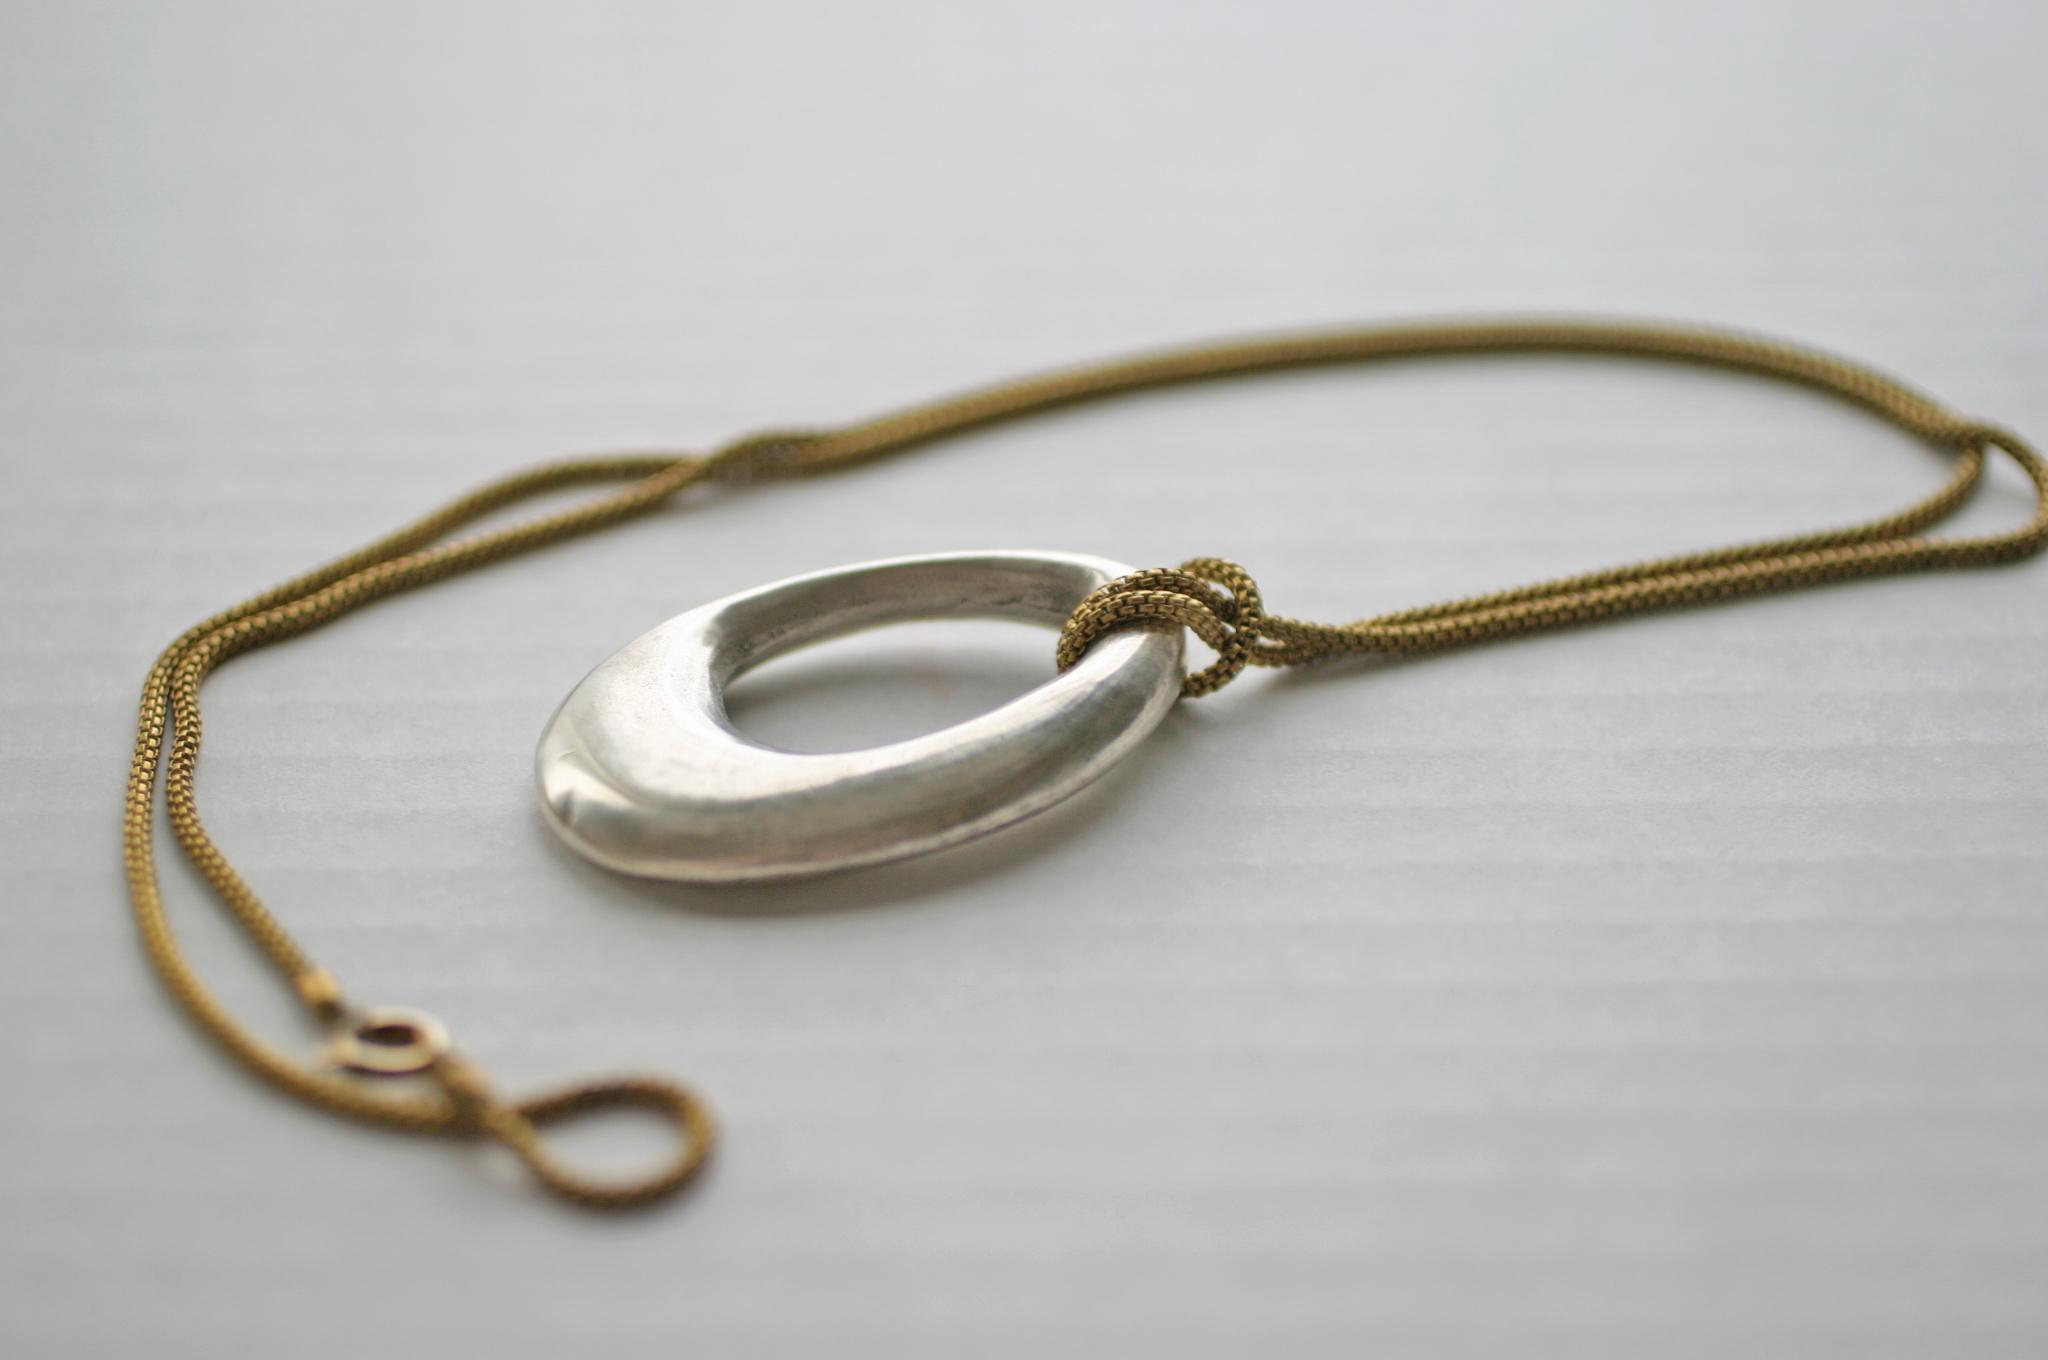 Elizabeth Baird Architecture-Jewelry-cast silver pendant.jpg